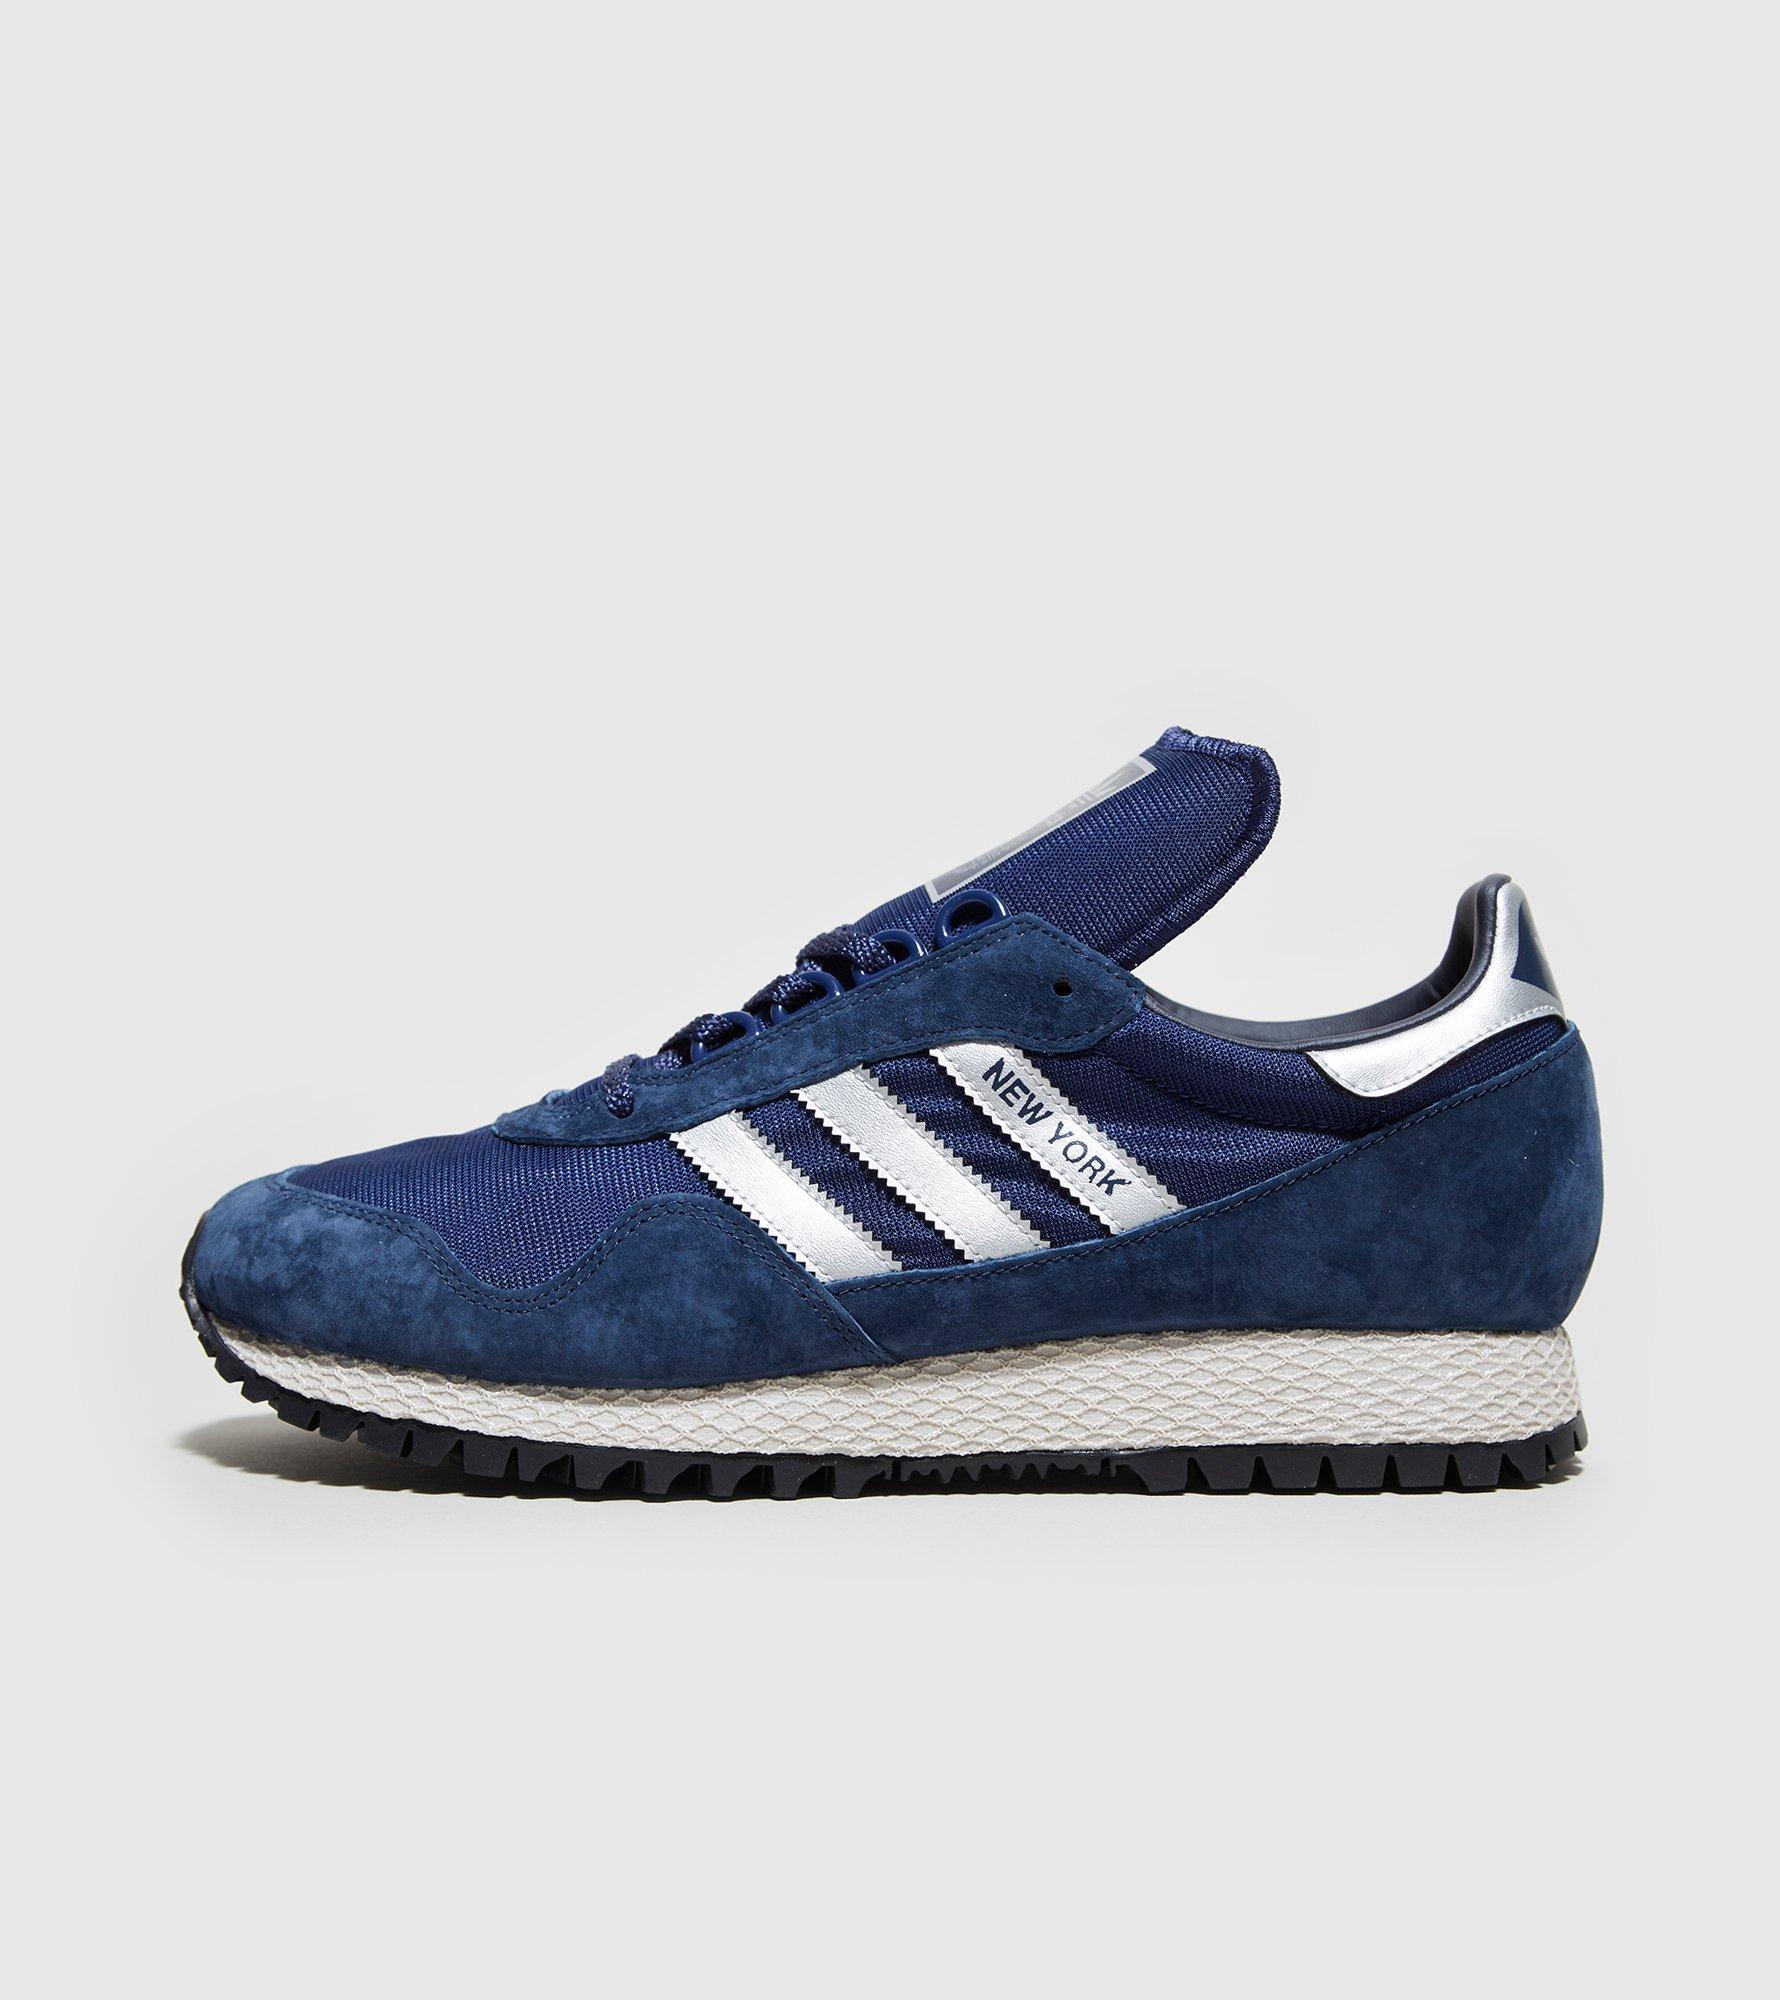 Blue Suede Ralph Lauren Shoes